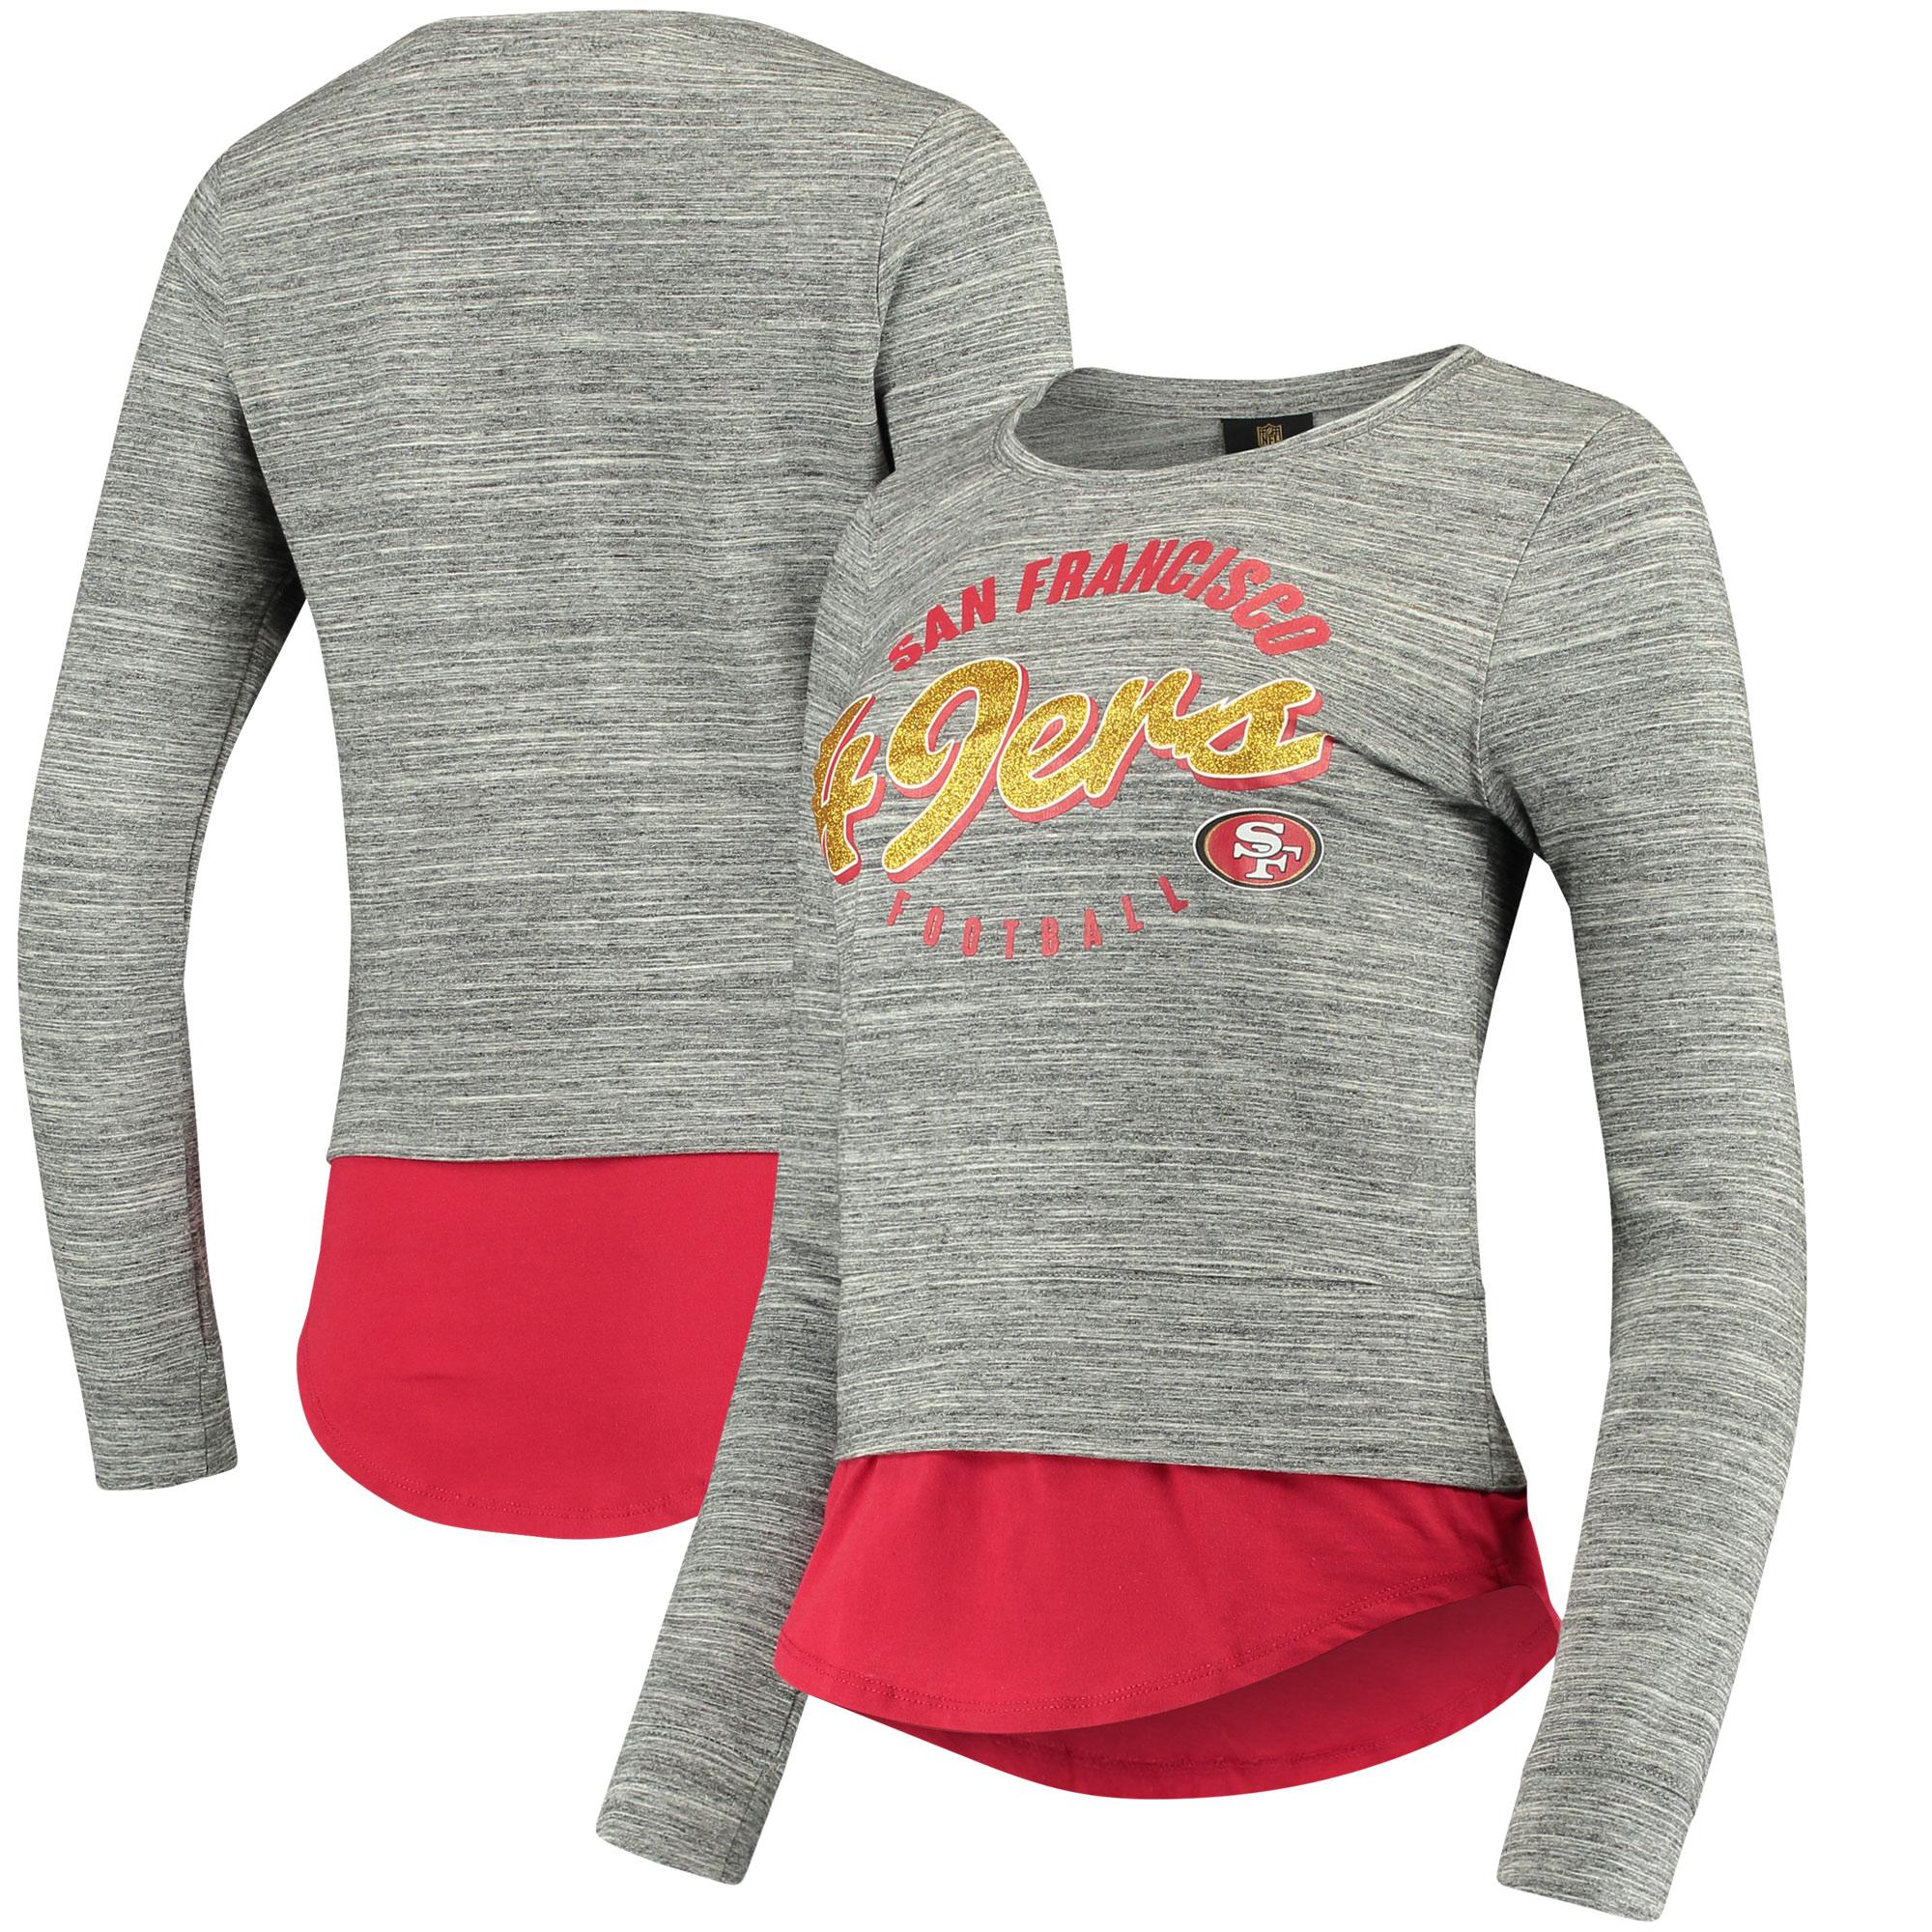 San Francisco 49ers Women's Juniors Shirt Tail Layered Long Sleeve T-Shirt - Heathered Gray/Scarlet